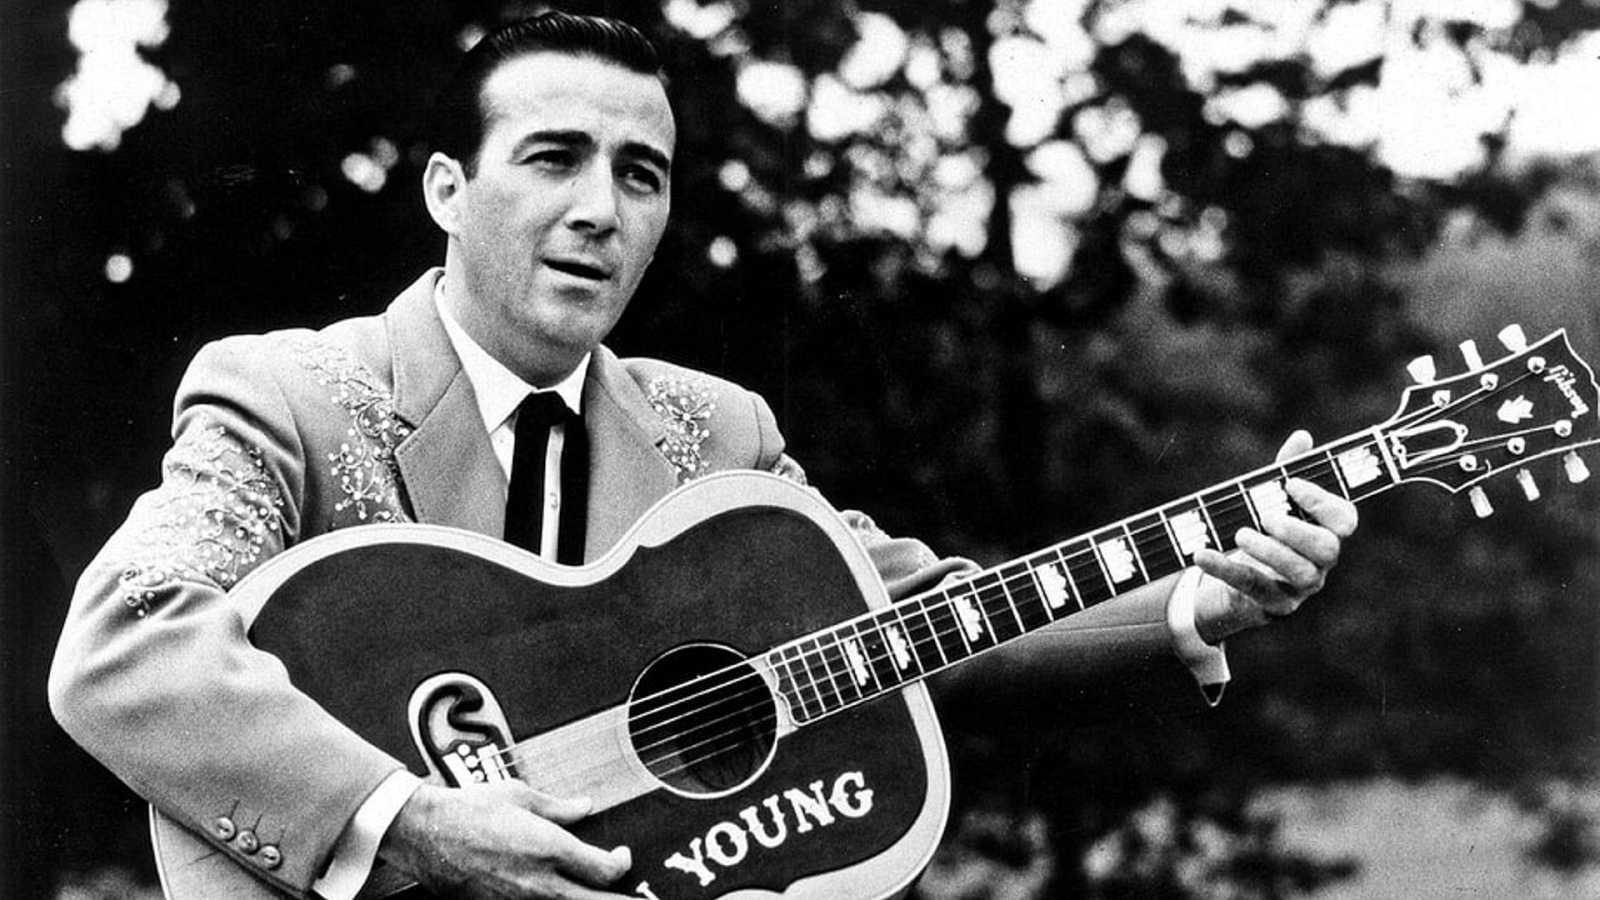 Rock and Roll High School - Cap. 81; Country (II) (1955-1968) - 22/09/21 - Escuchar ahora